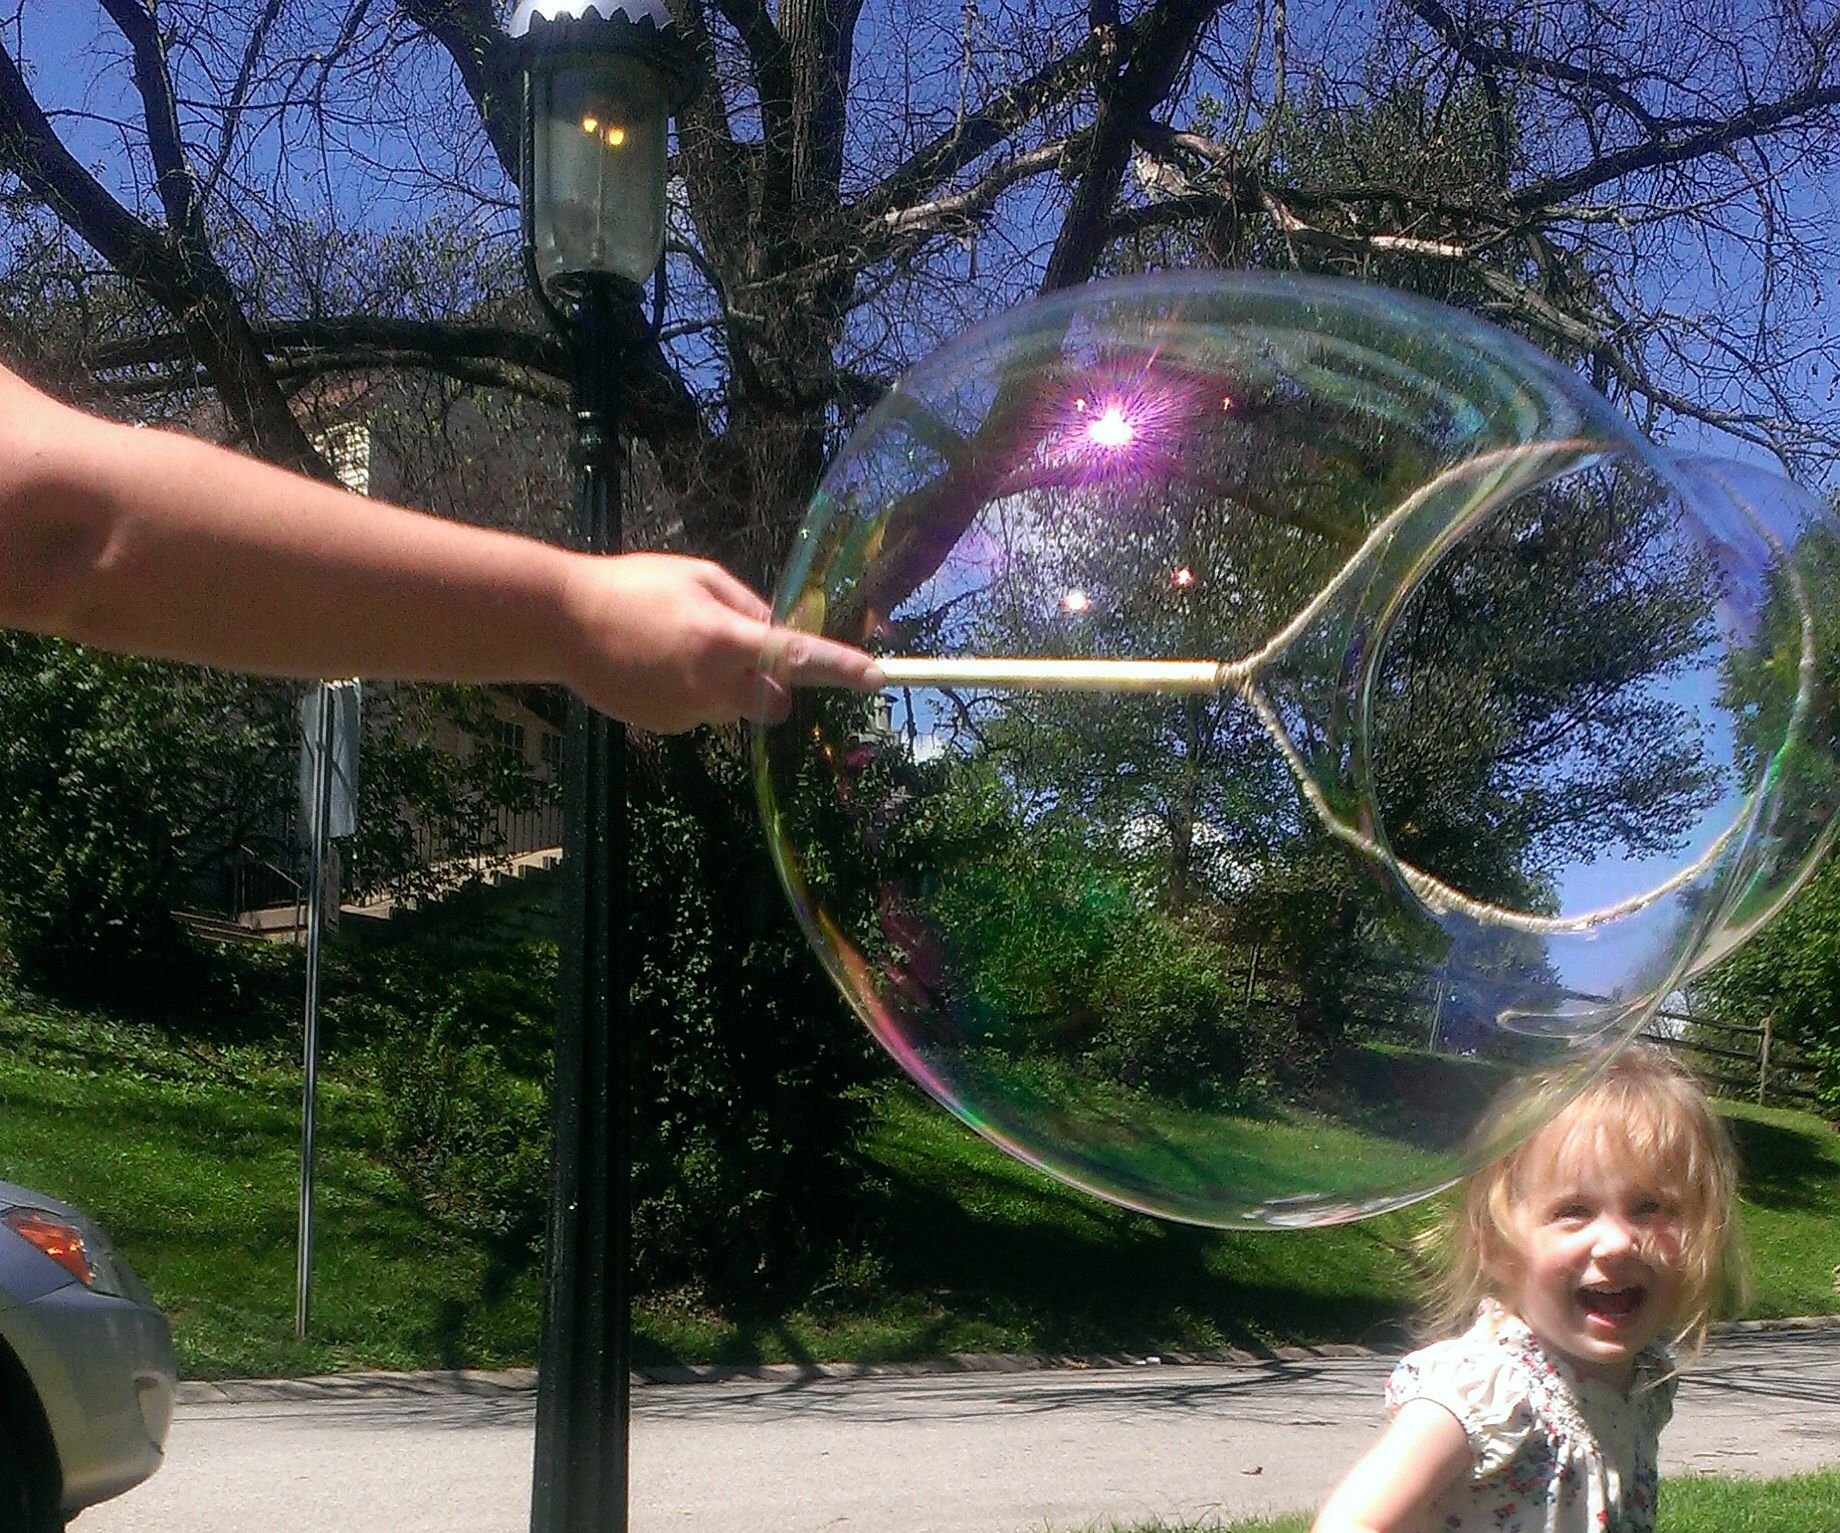 DIY Bubble Wand